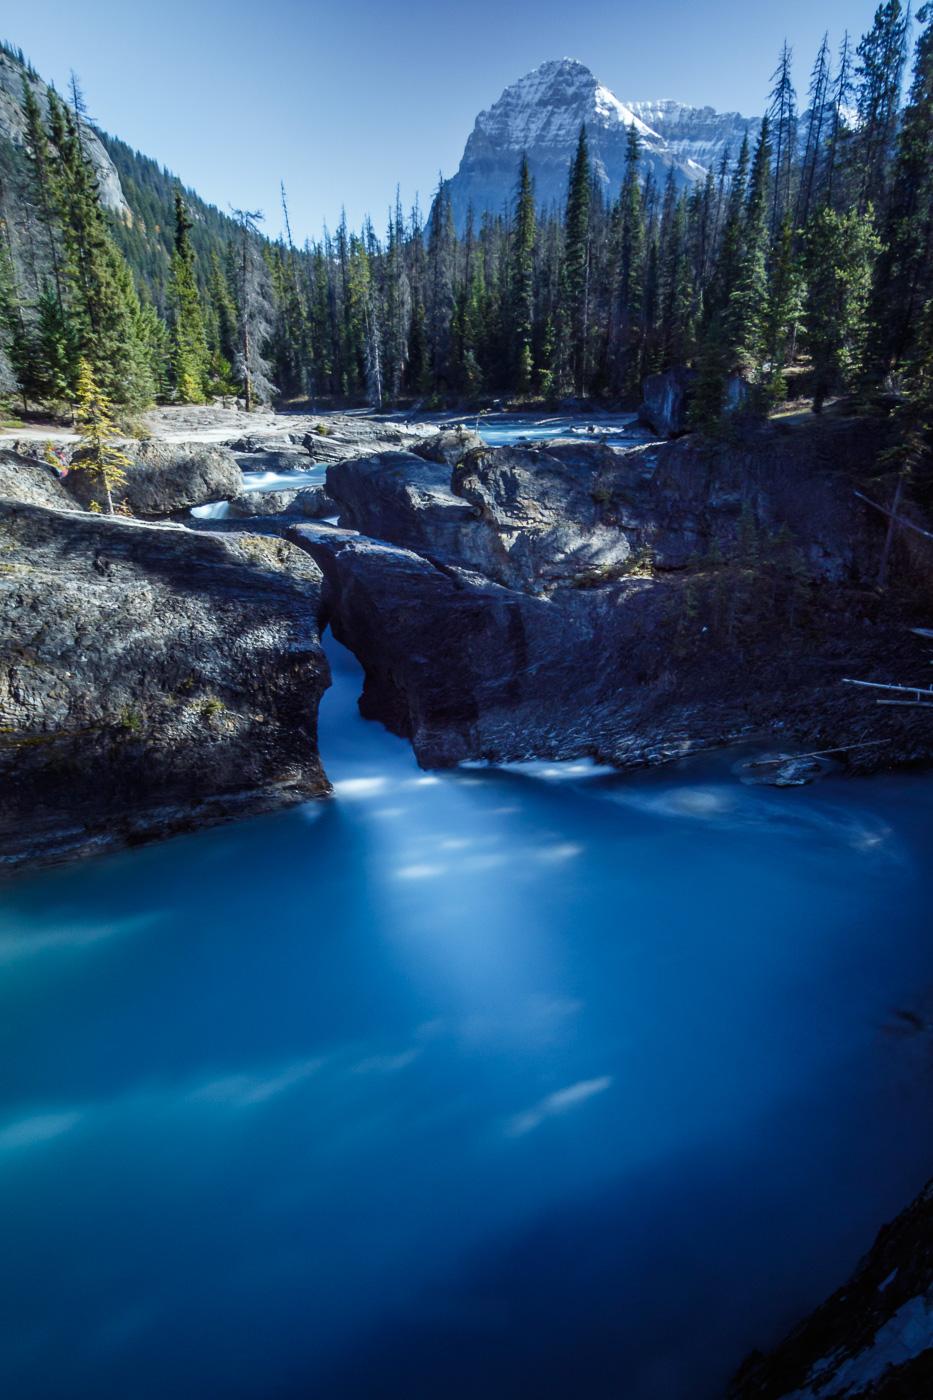 Kicking Horse River slowspeed photography - Paisatges de Nord-Amèrica - Raül Carmona - Fotografia, Fotografia d'estudi, esdeveniments i Natura